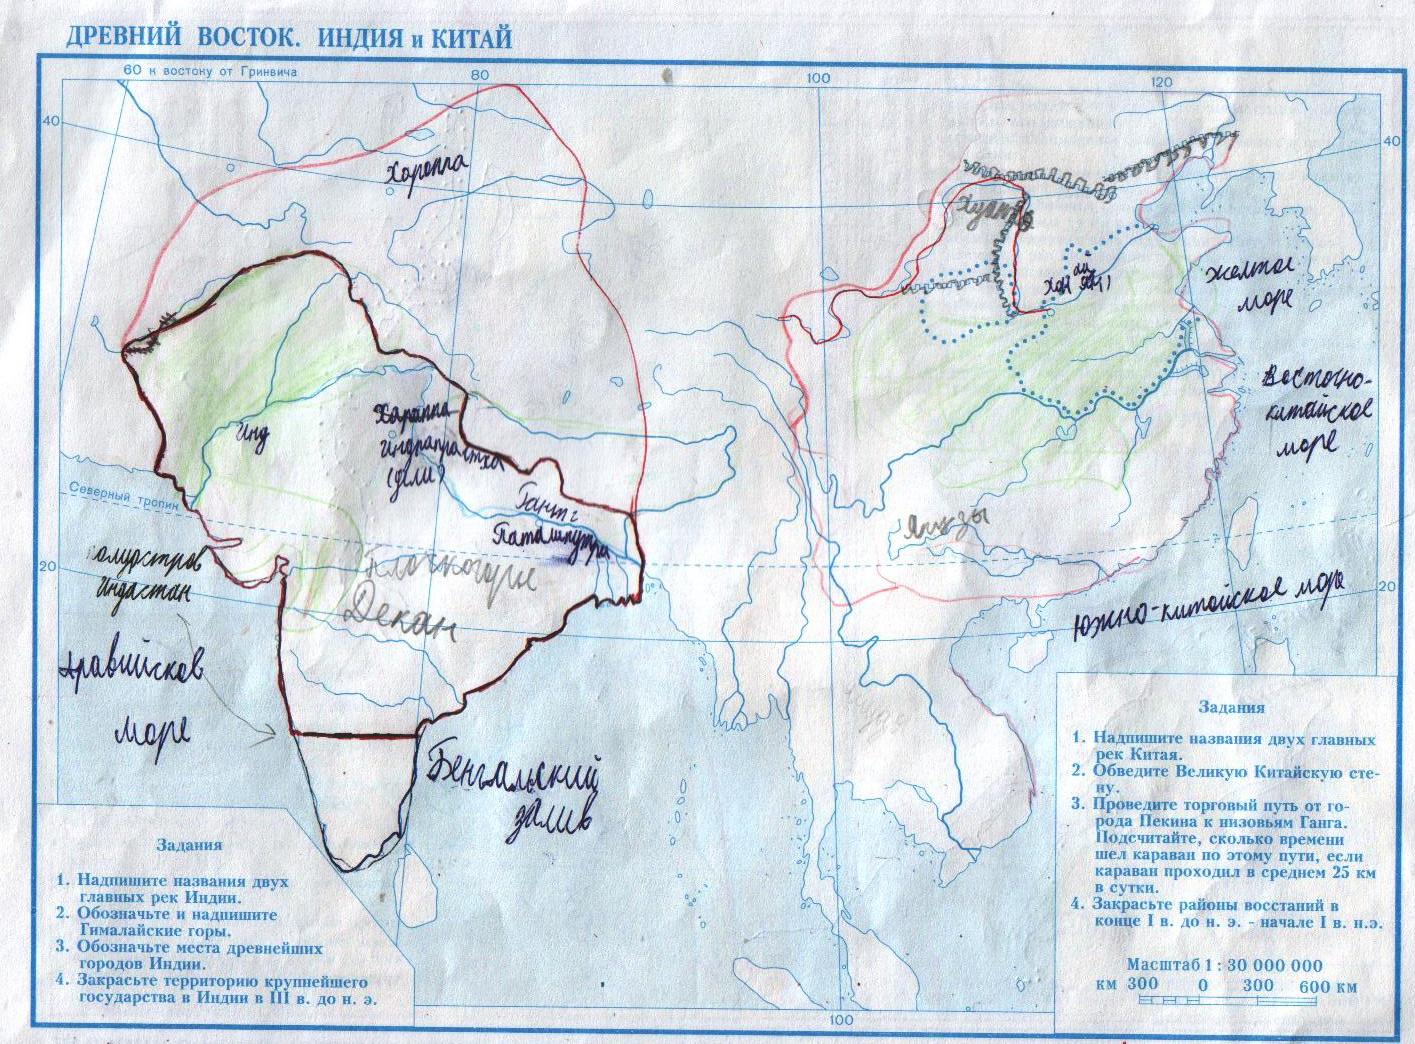 Контурная карта древний восток 5 класс